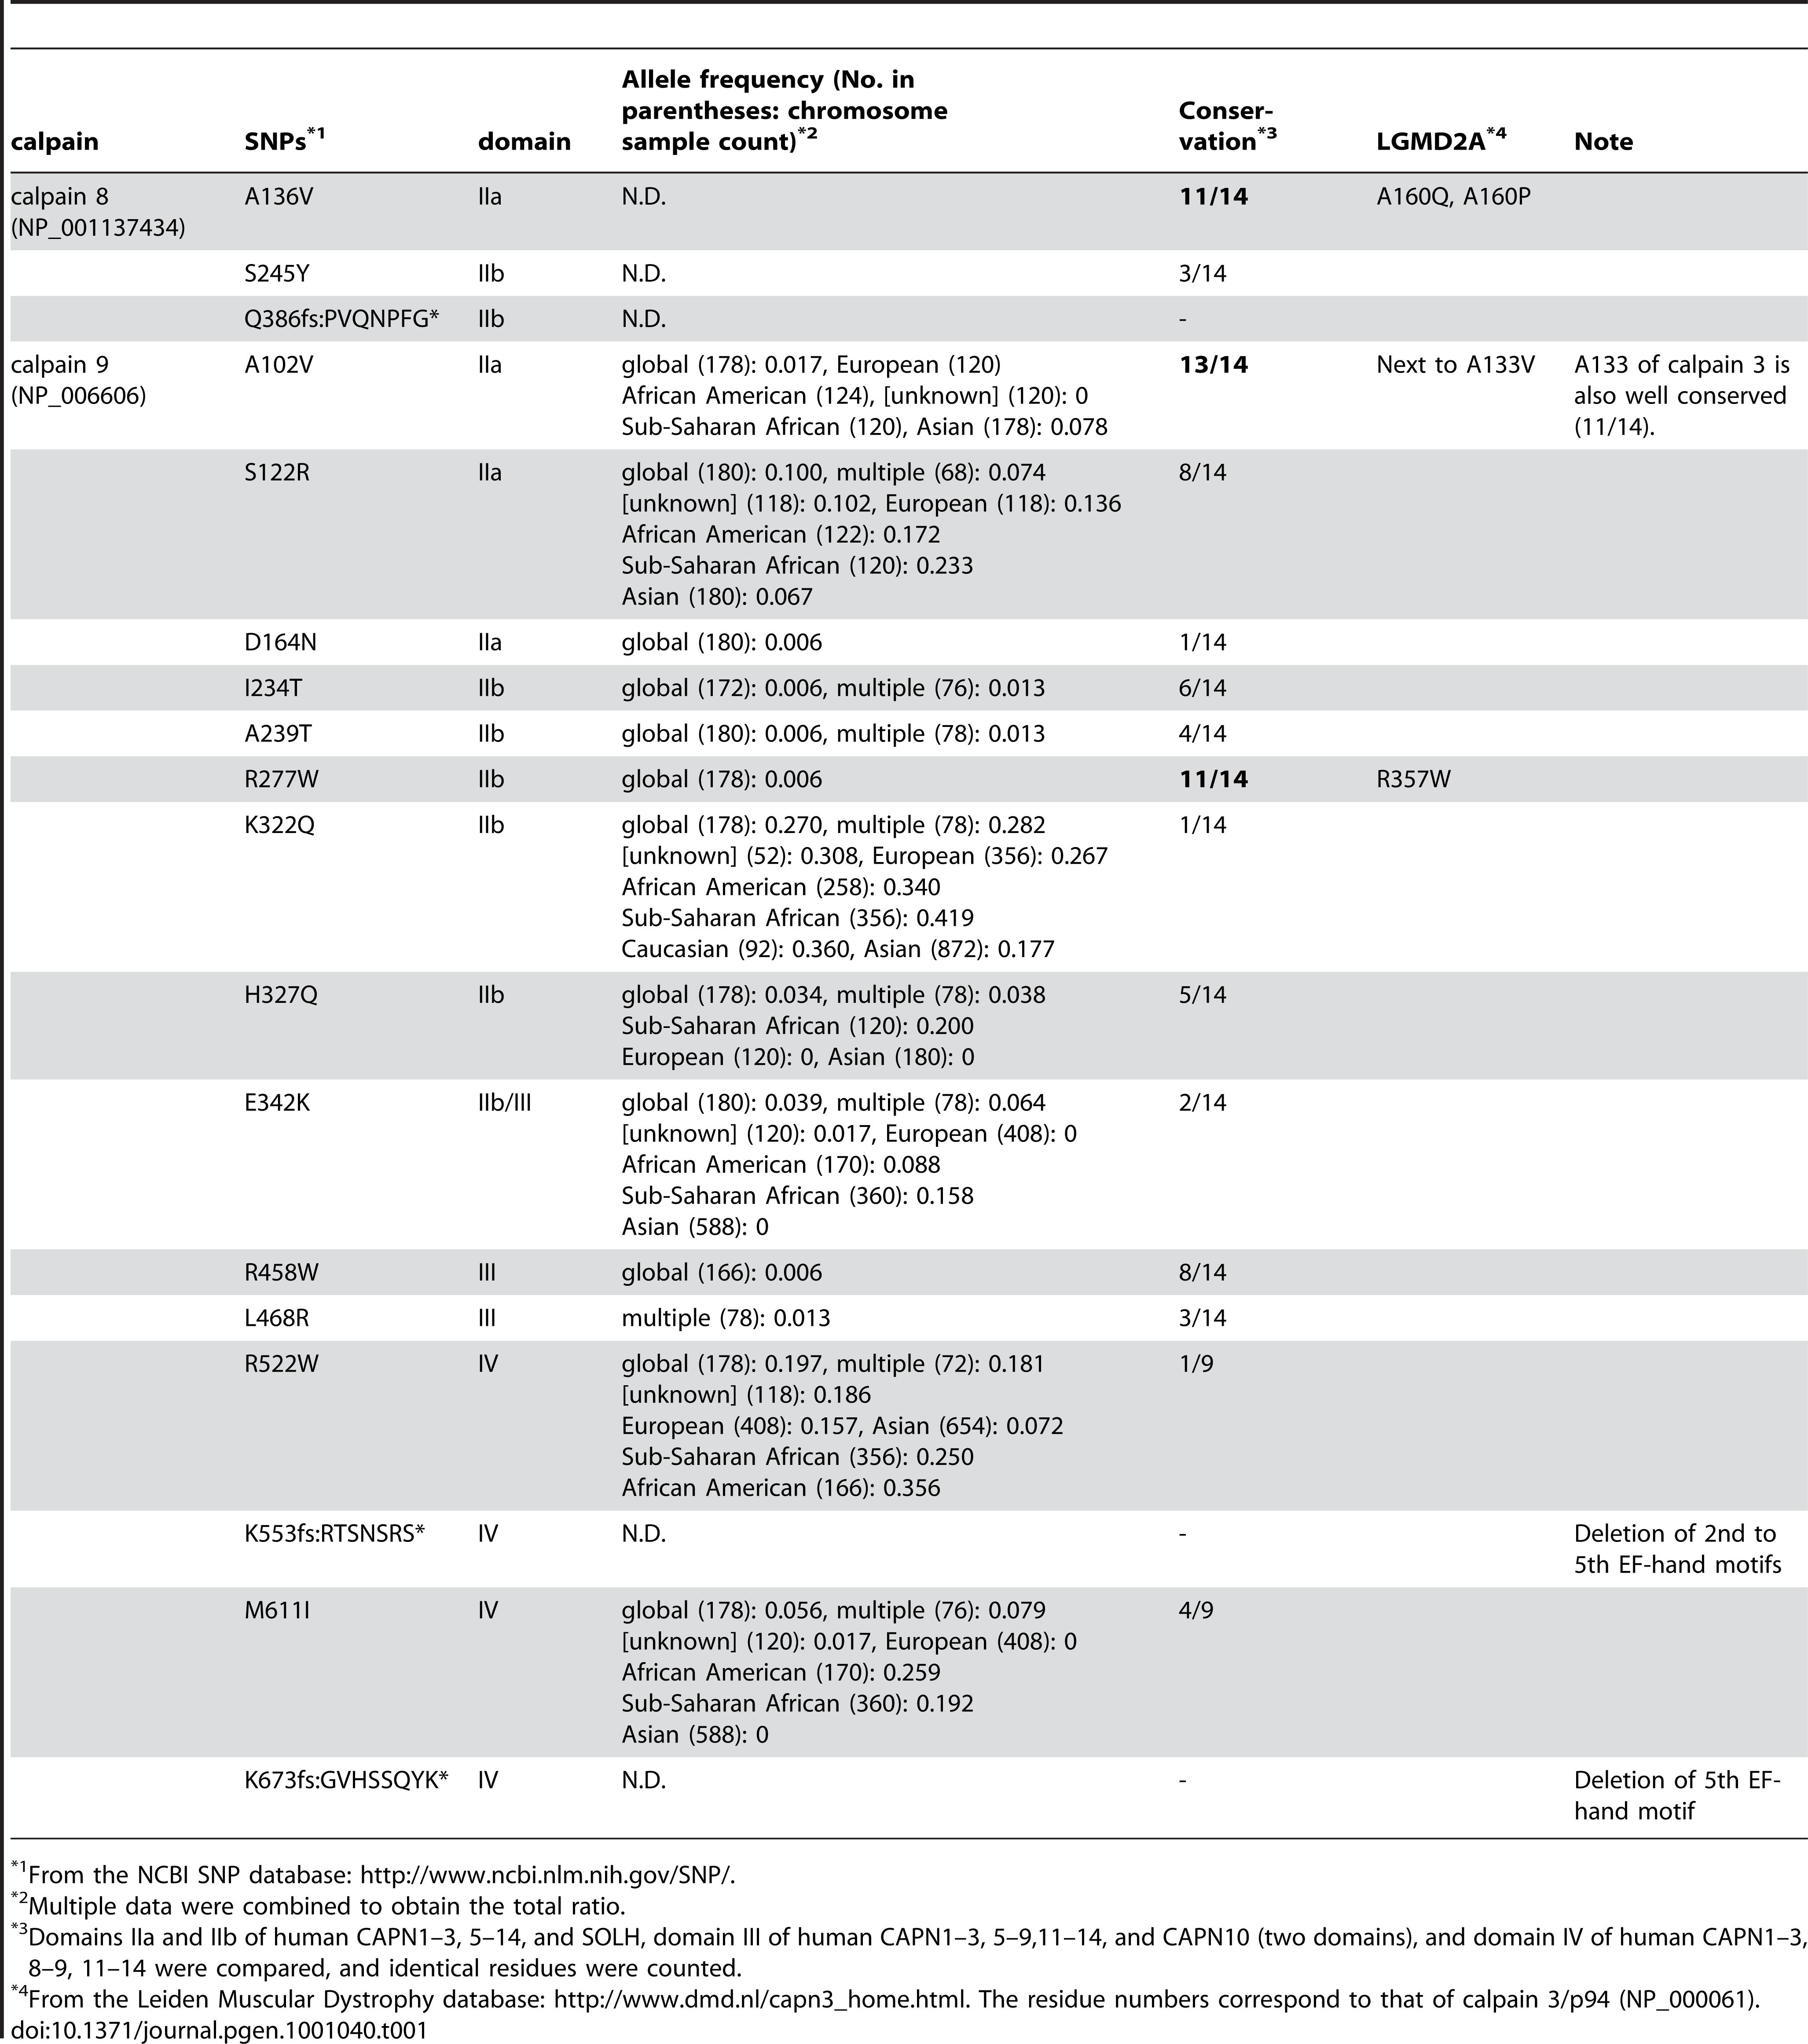 Missense SNPs in human <i>CAPN8</i> and <i>CAPN9</i> and related LGMD2A pathogenic mutations in <i>CAPN3</i>.